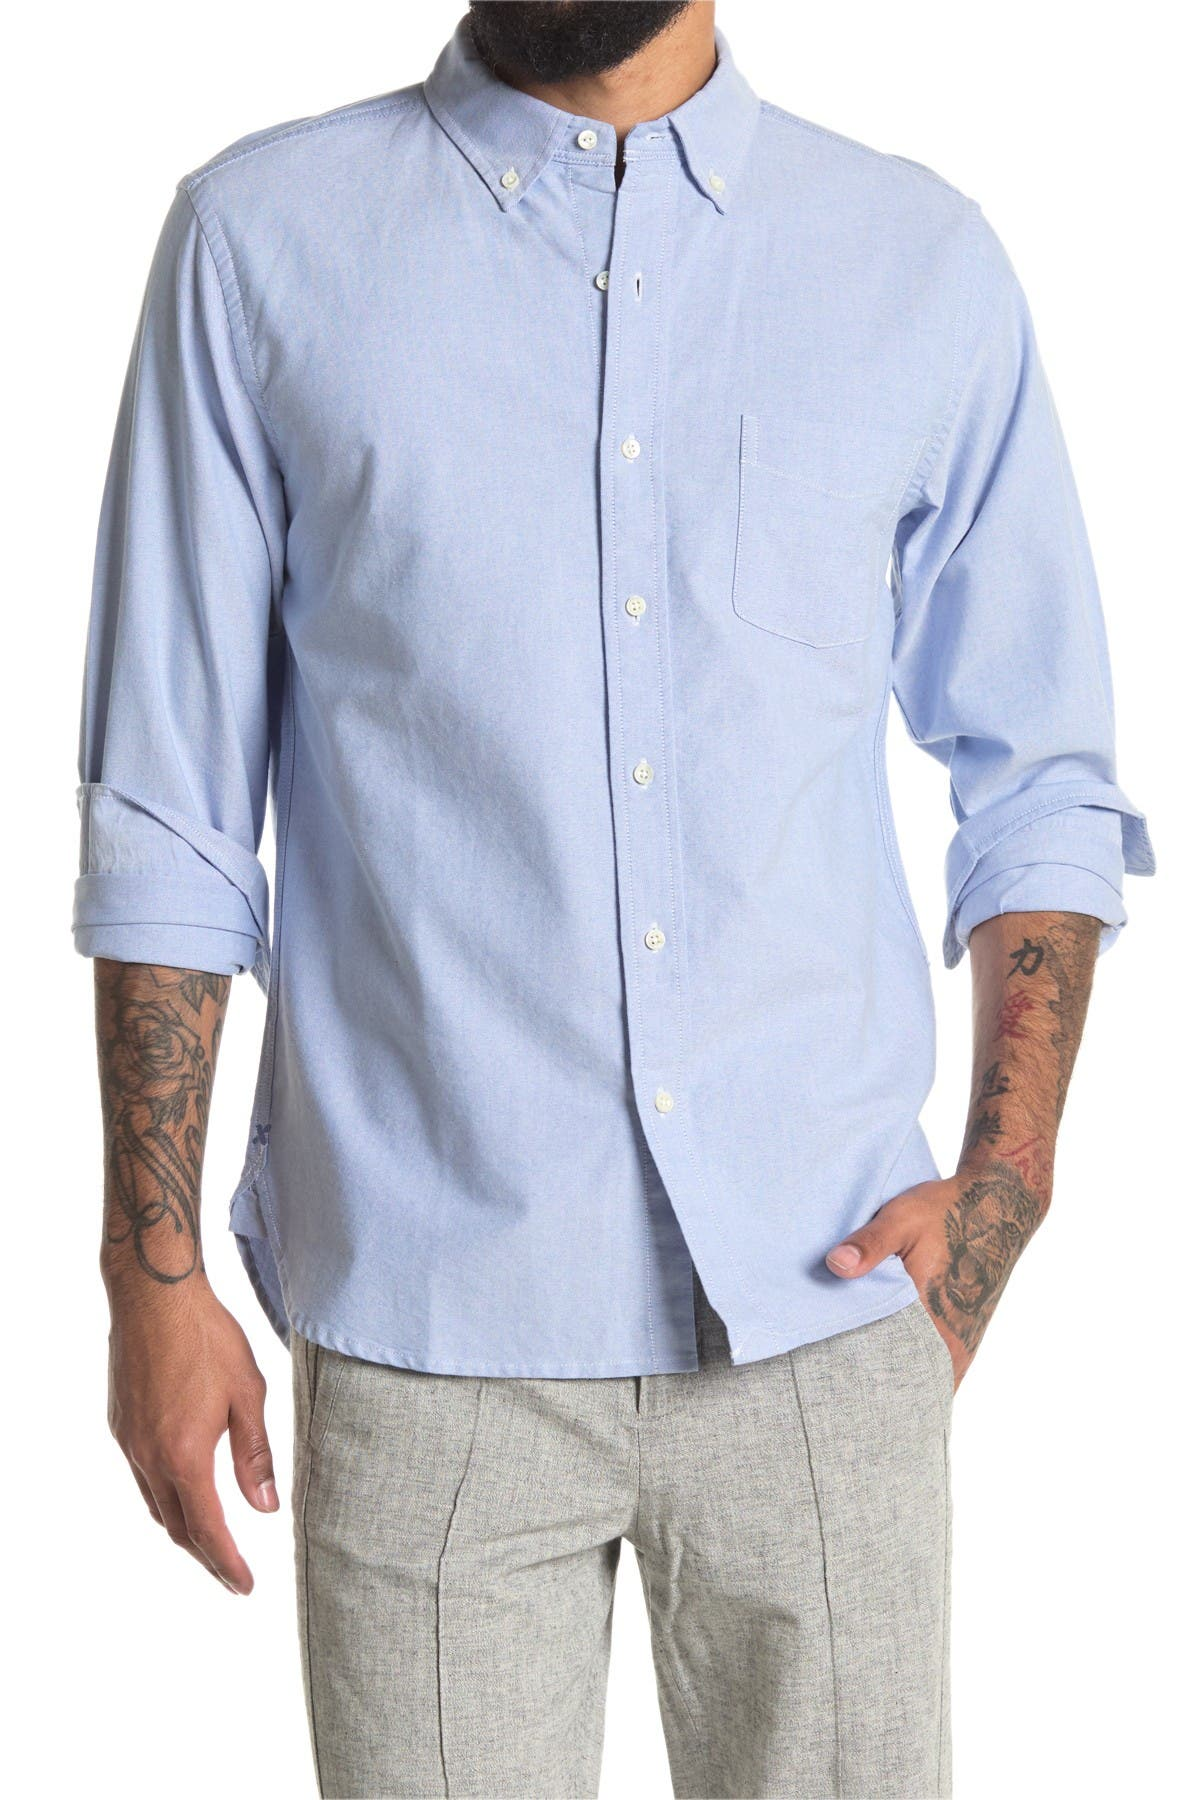 Image of ALEX MILL Regular Fit Oxford Shirt